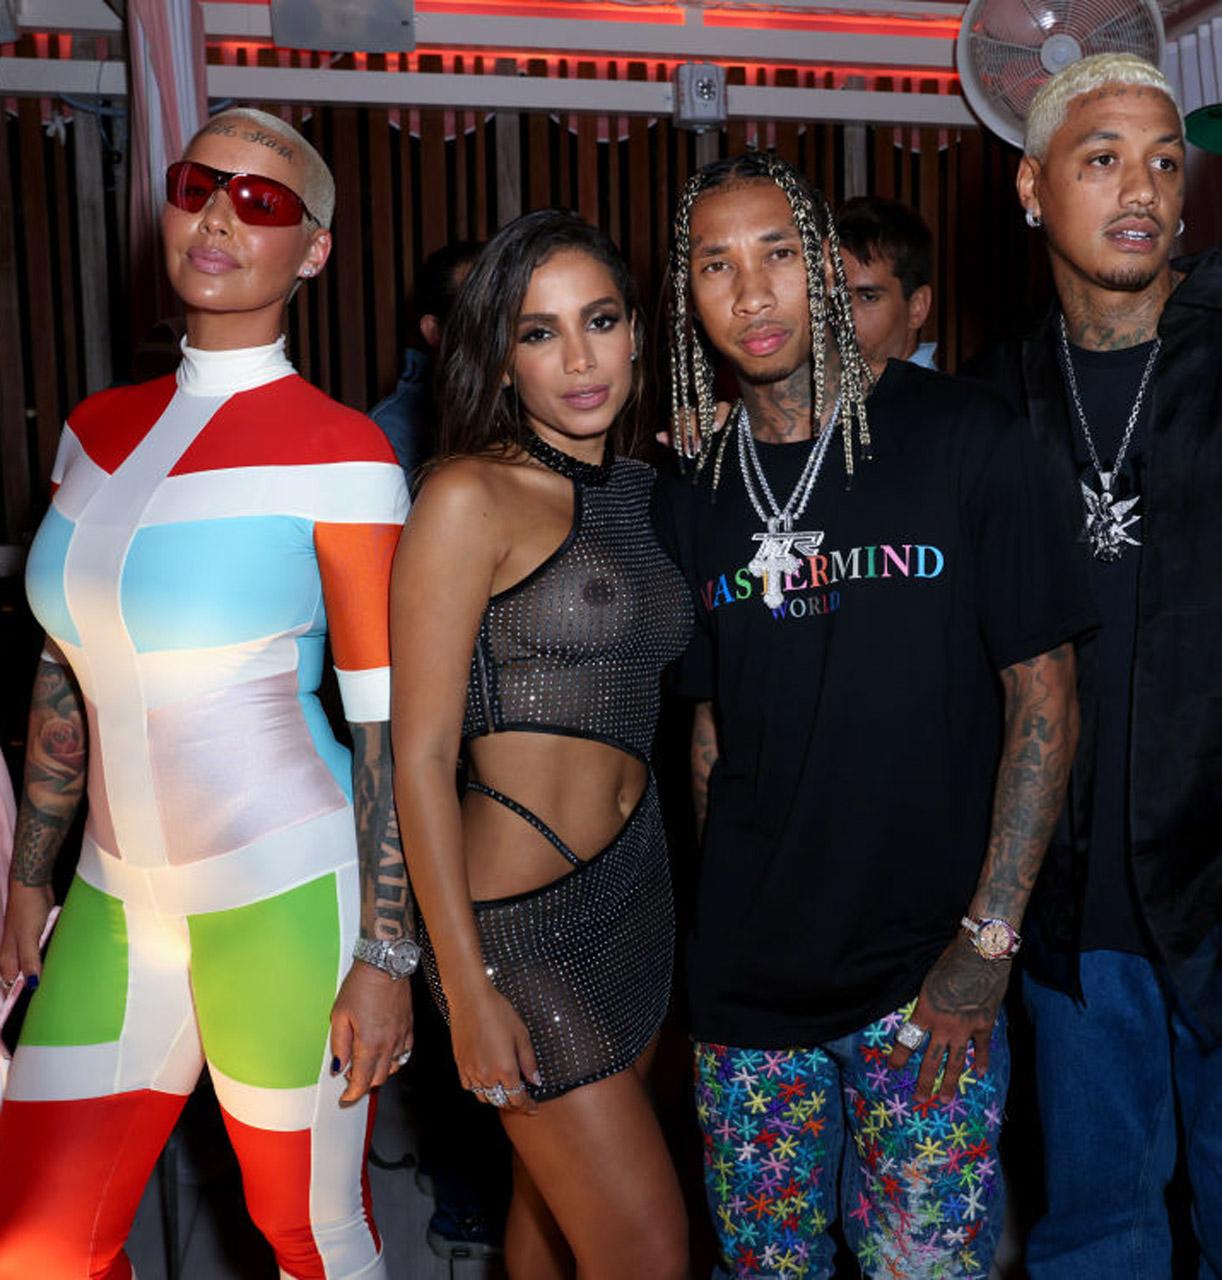 Amber Rose, den brasilianske popsuperstjernen Anitta alias Larissa de Macedo Machado, Tyga og A.E. i Miami i april 2021 (Alexander Tamargo/Getty)